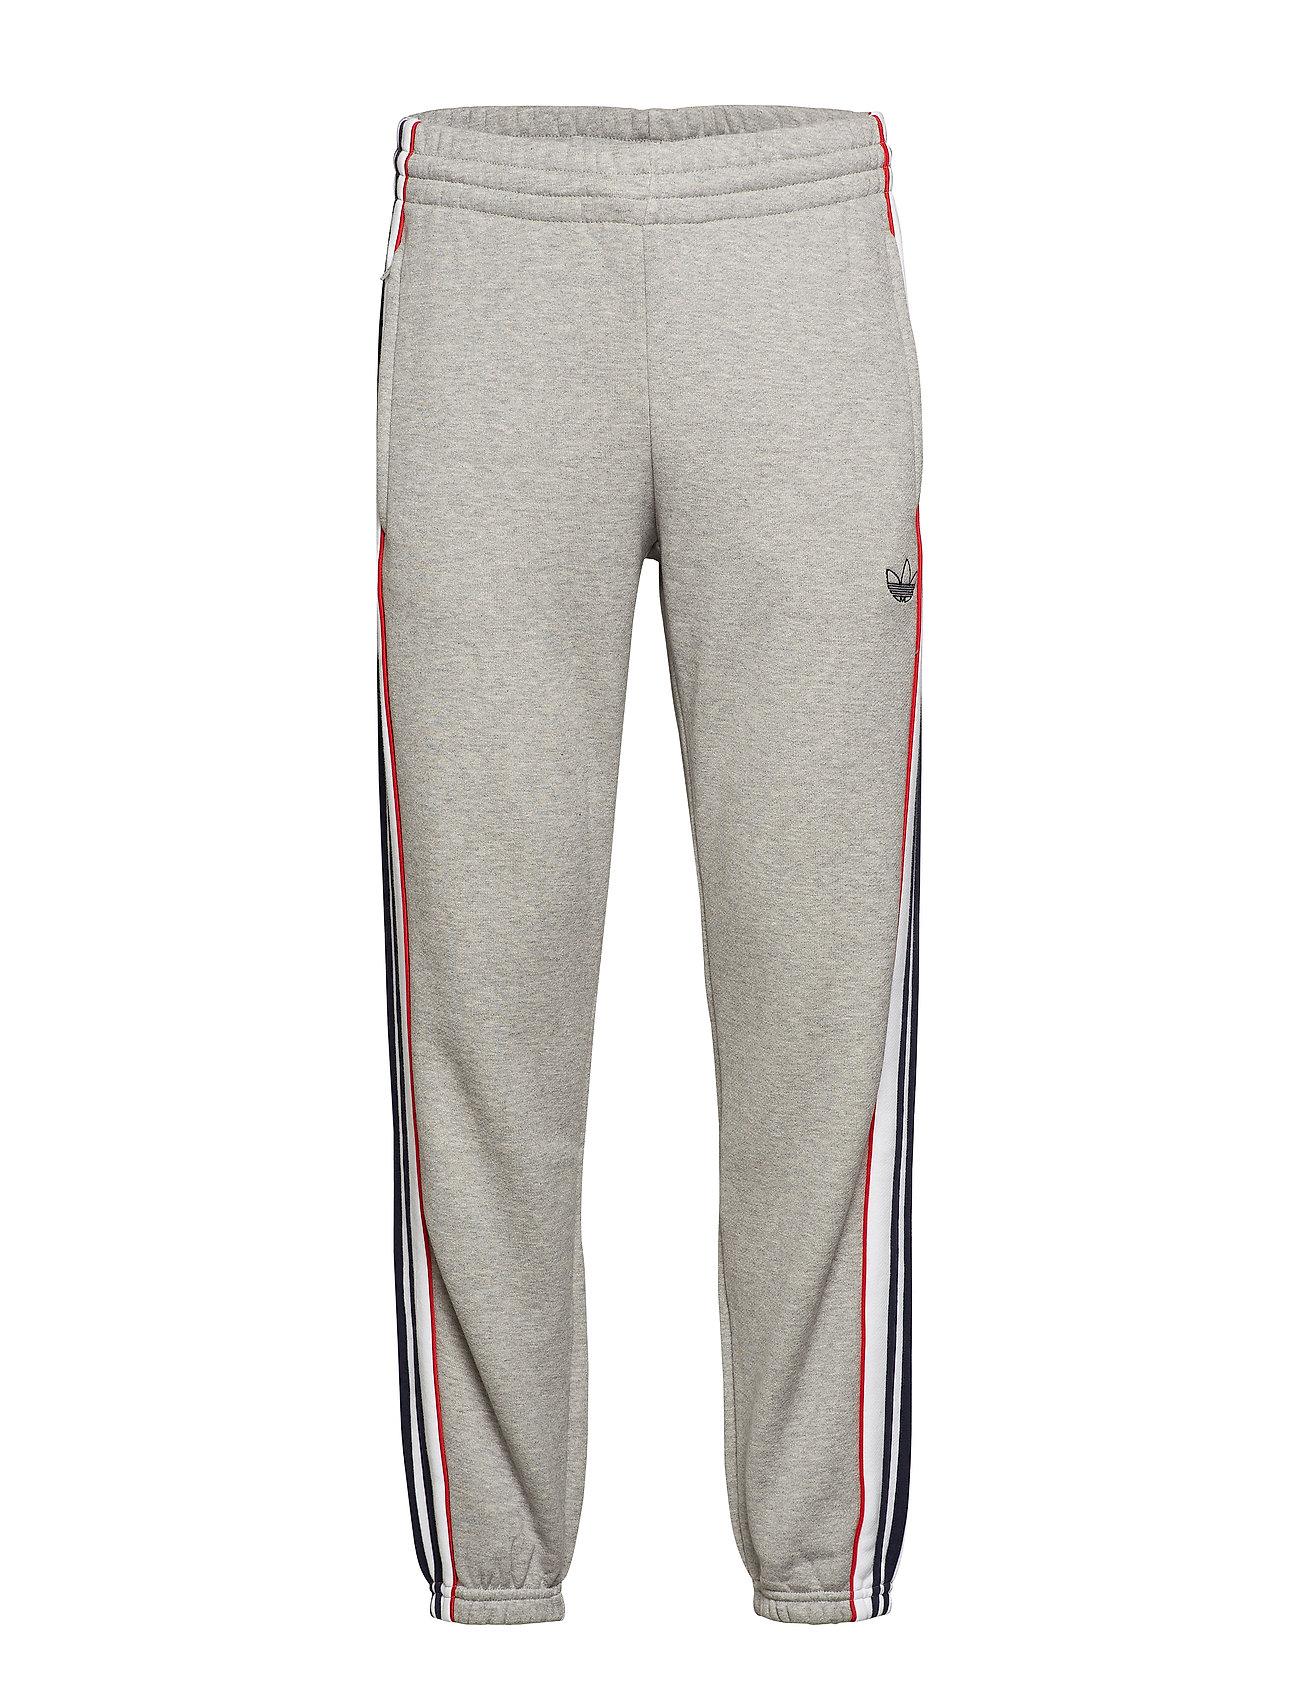 adidas Originals 3 STRIPE PANEL - MGREYH/WHITE